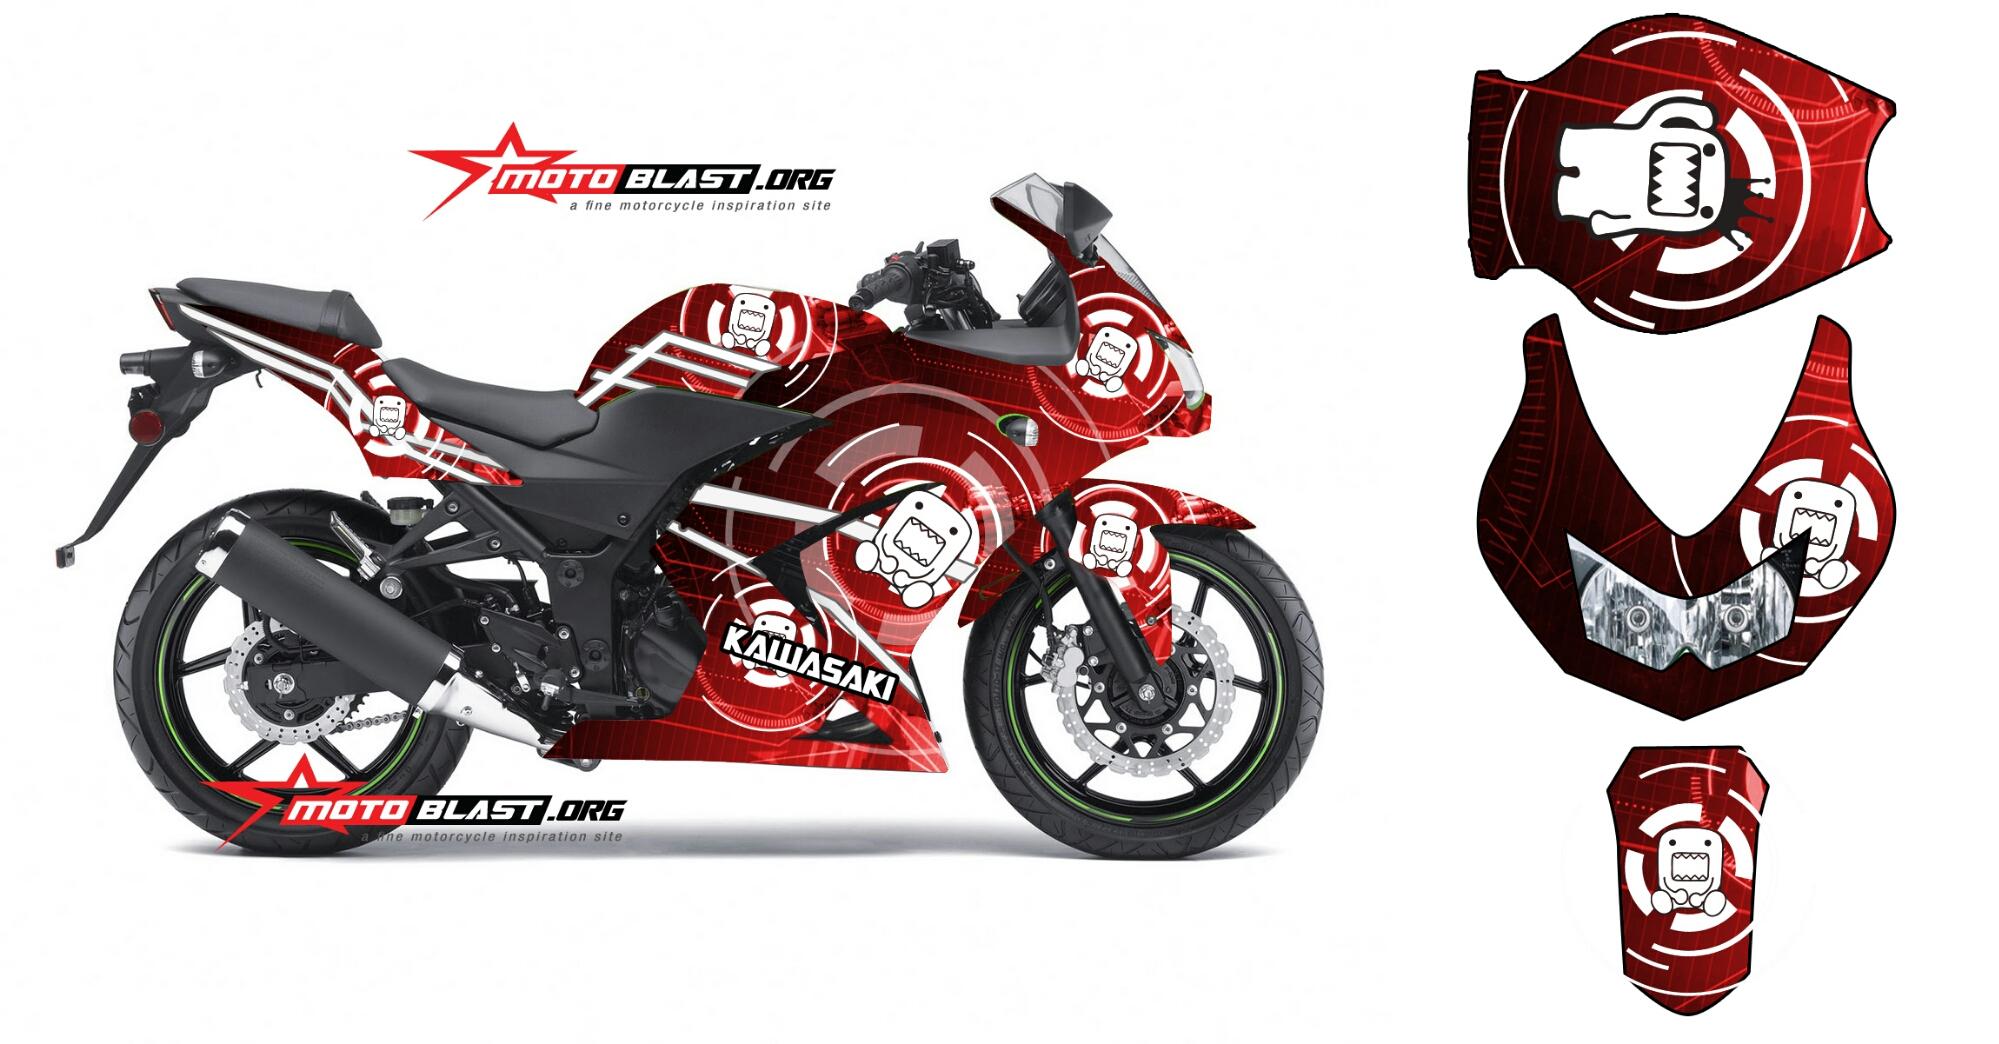 100 Gambar Motor Ninja Kartun Terlengkap Obeng Motor